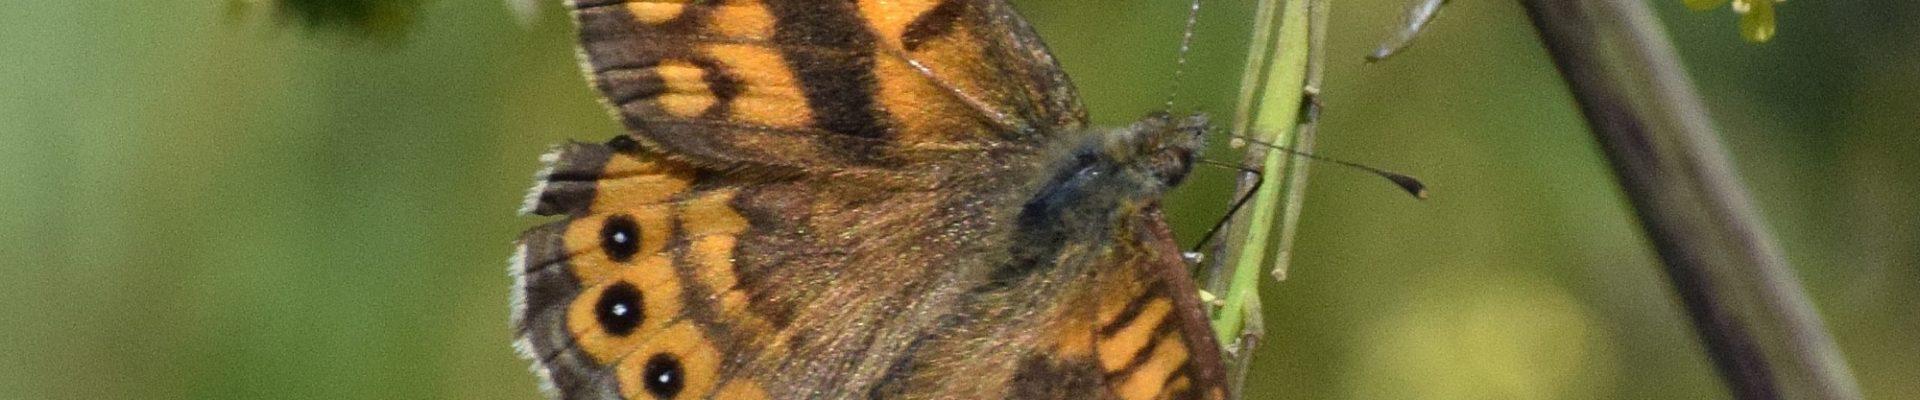 Vlinderwerkgroep Drenthe